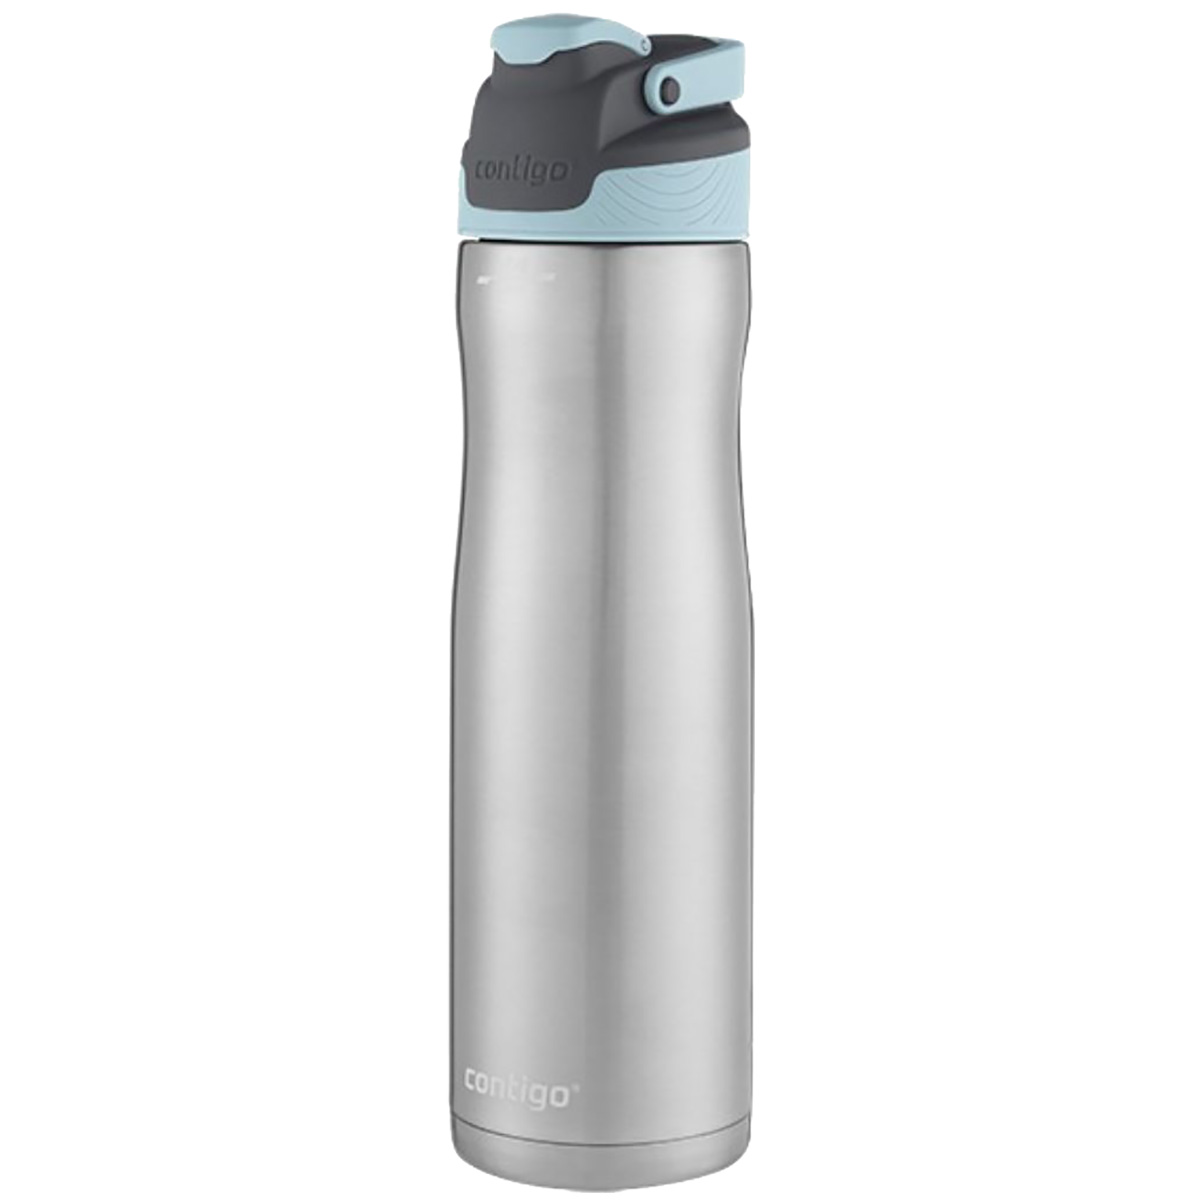 Contigo-24-oz-Chill-Autoseal-Stainless-Steel-Water-Bottle thumbnail 10